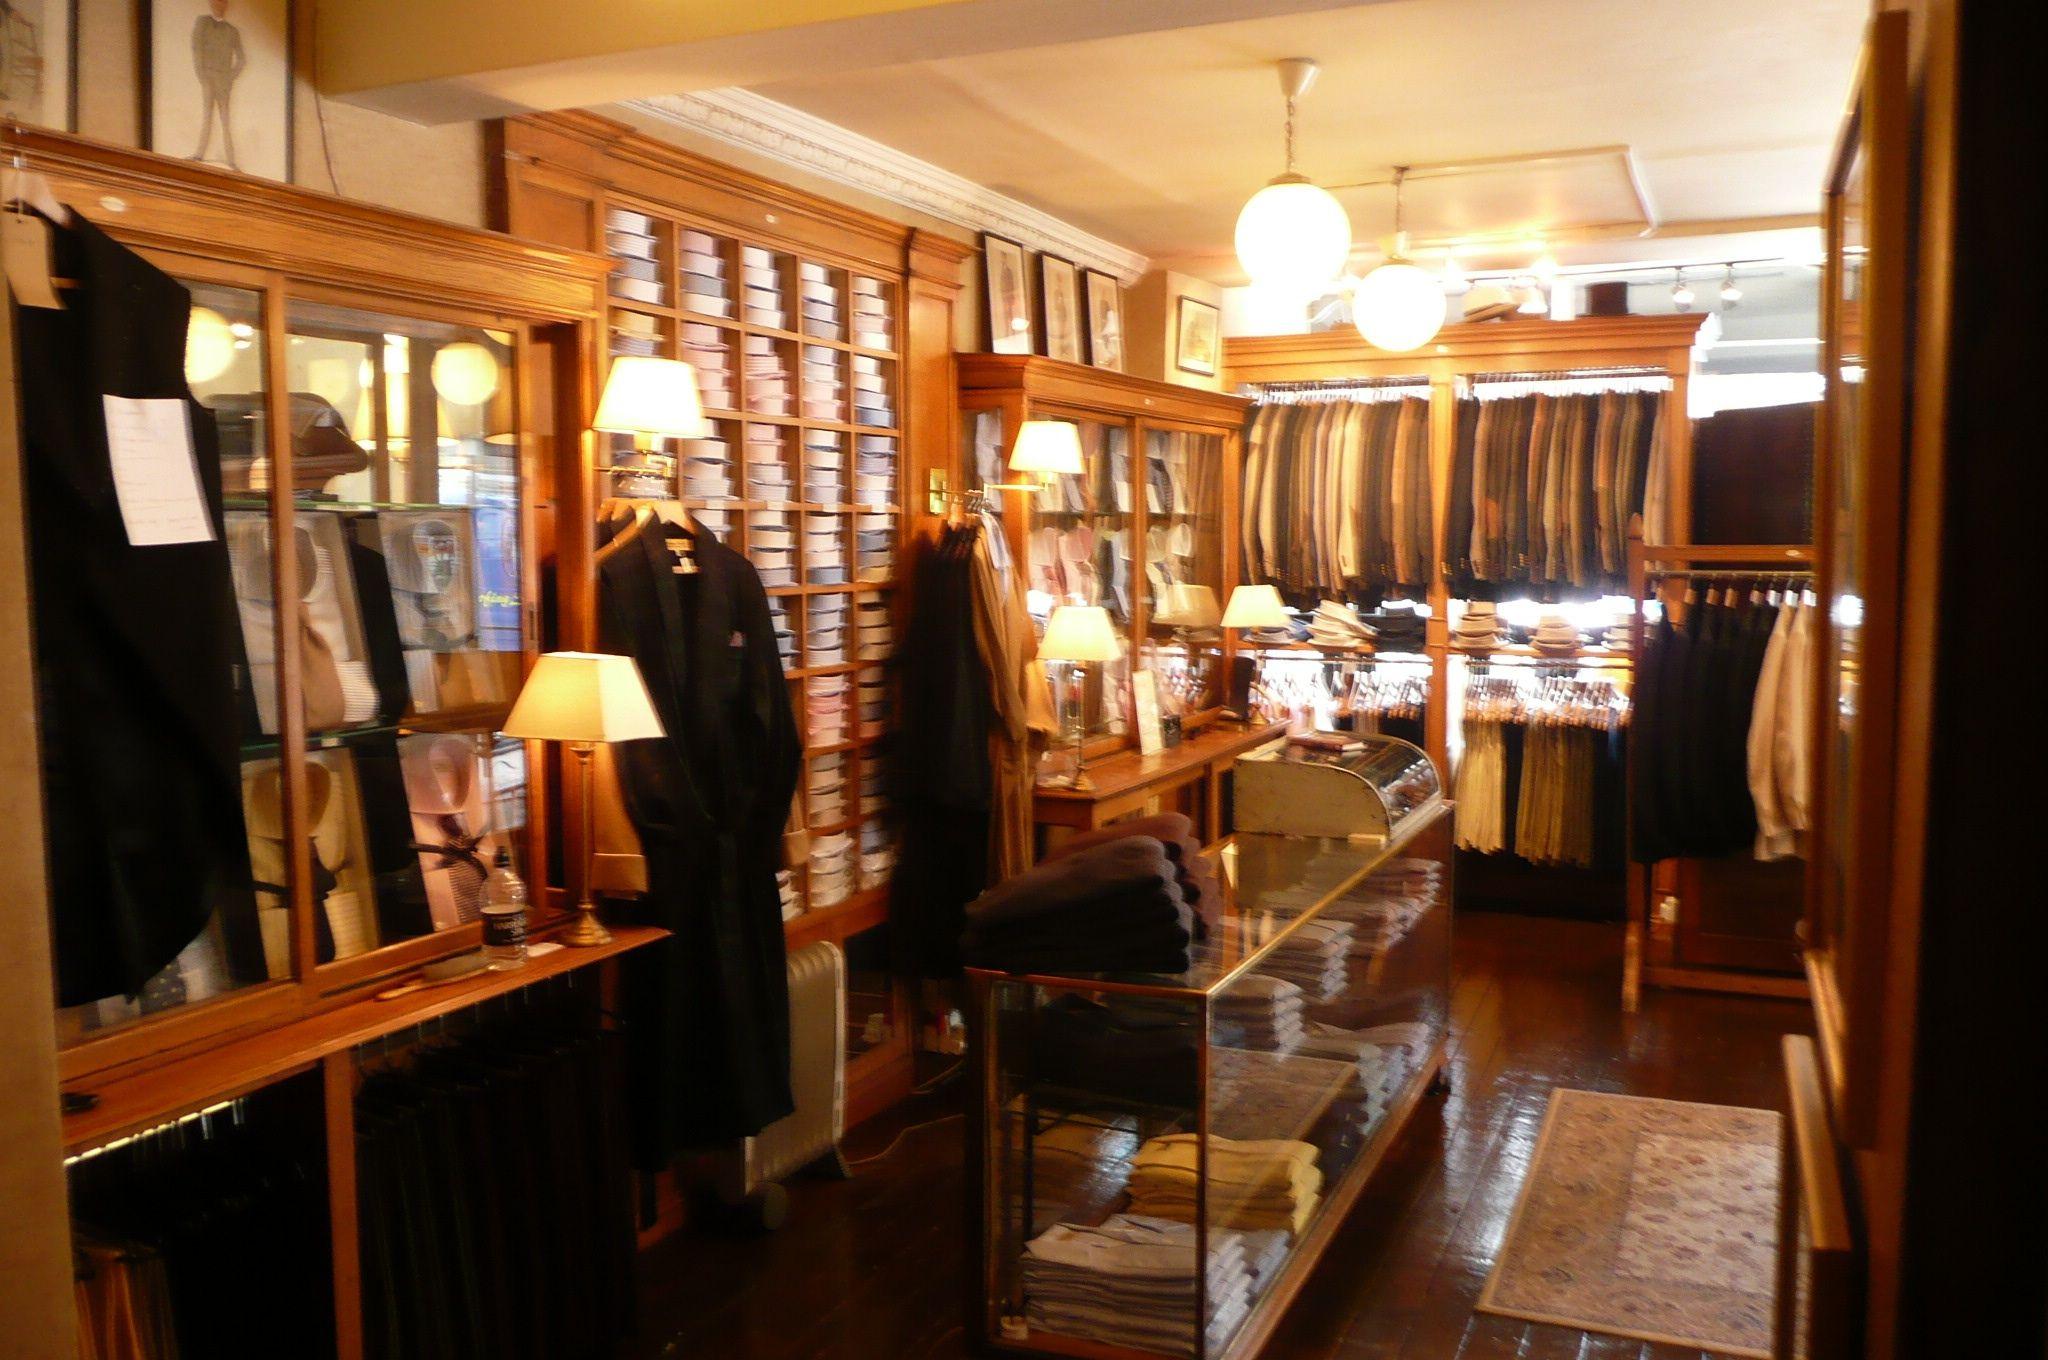 Rhodes-Wood is worth a visit when in Harrogate. 56-58 Parliament Street